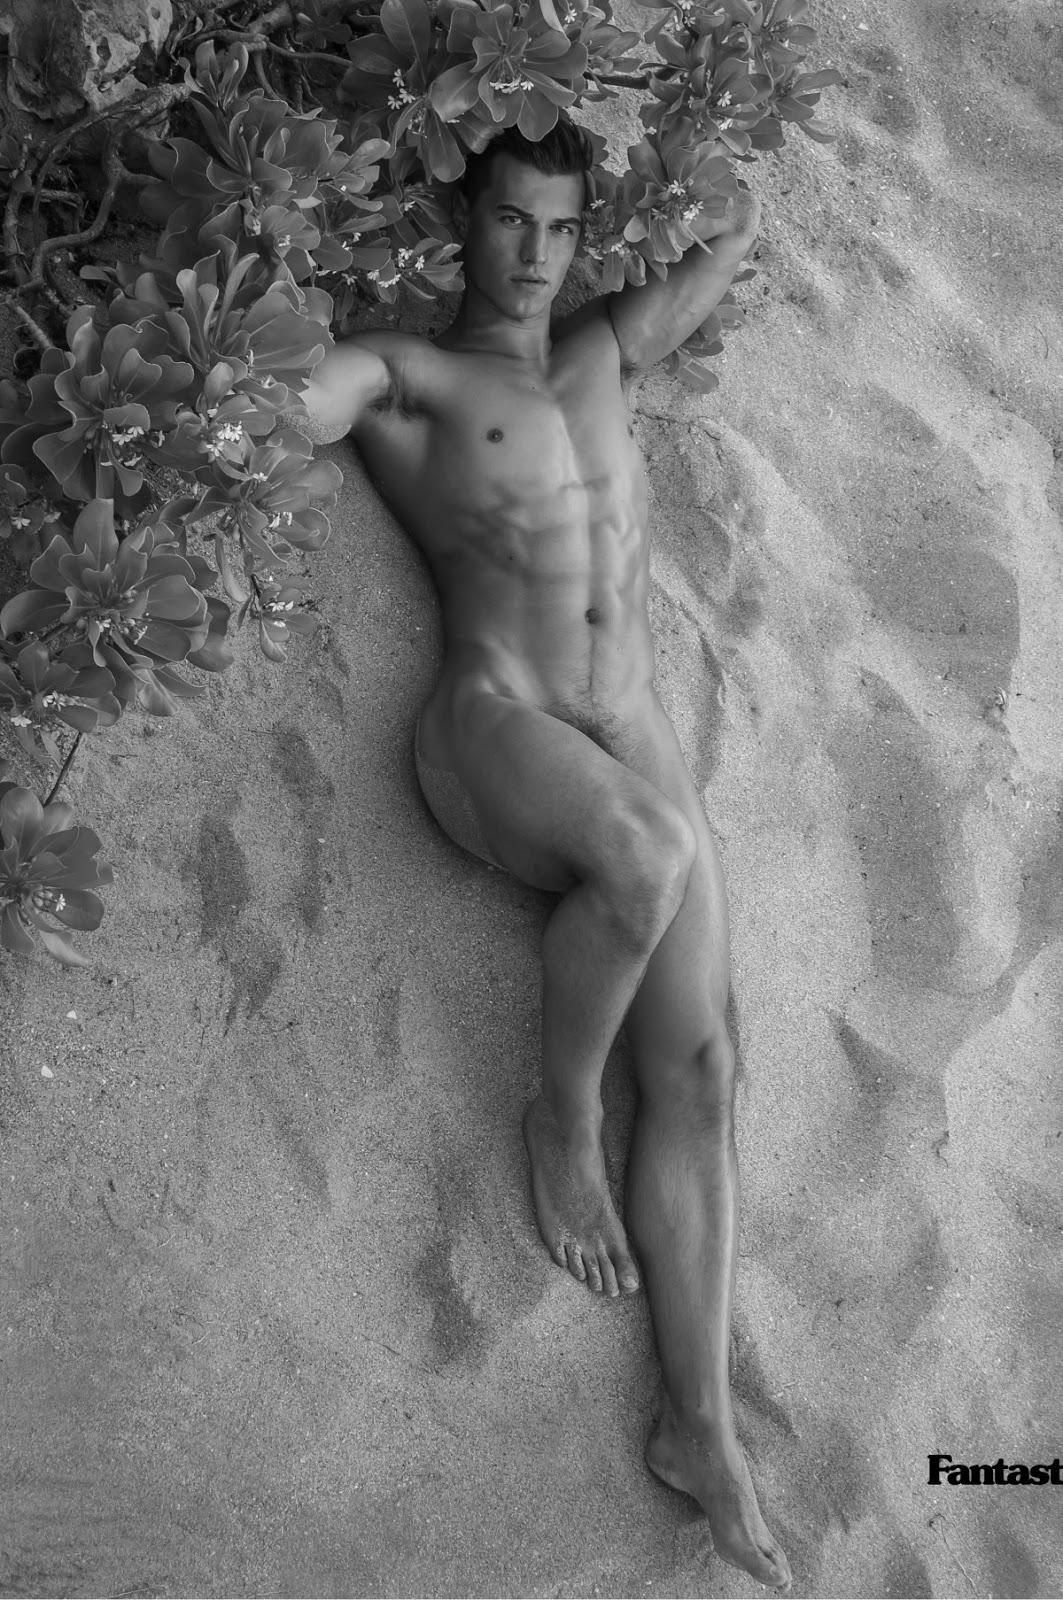 Naked muscle men erotica